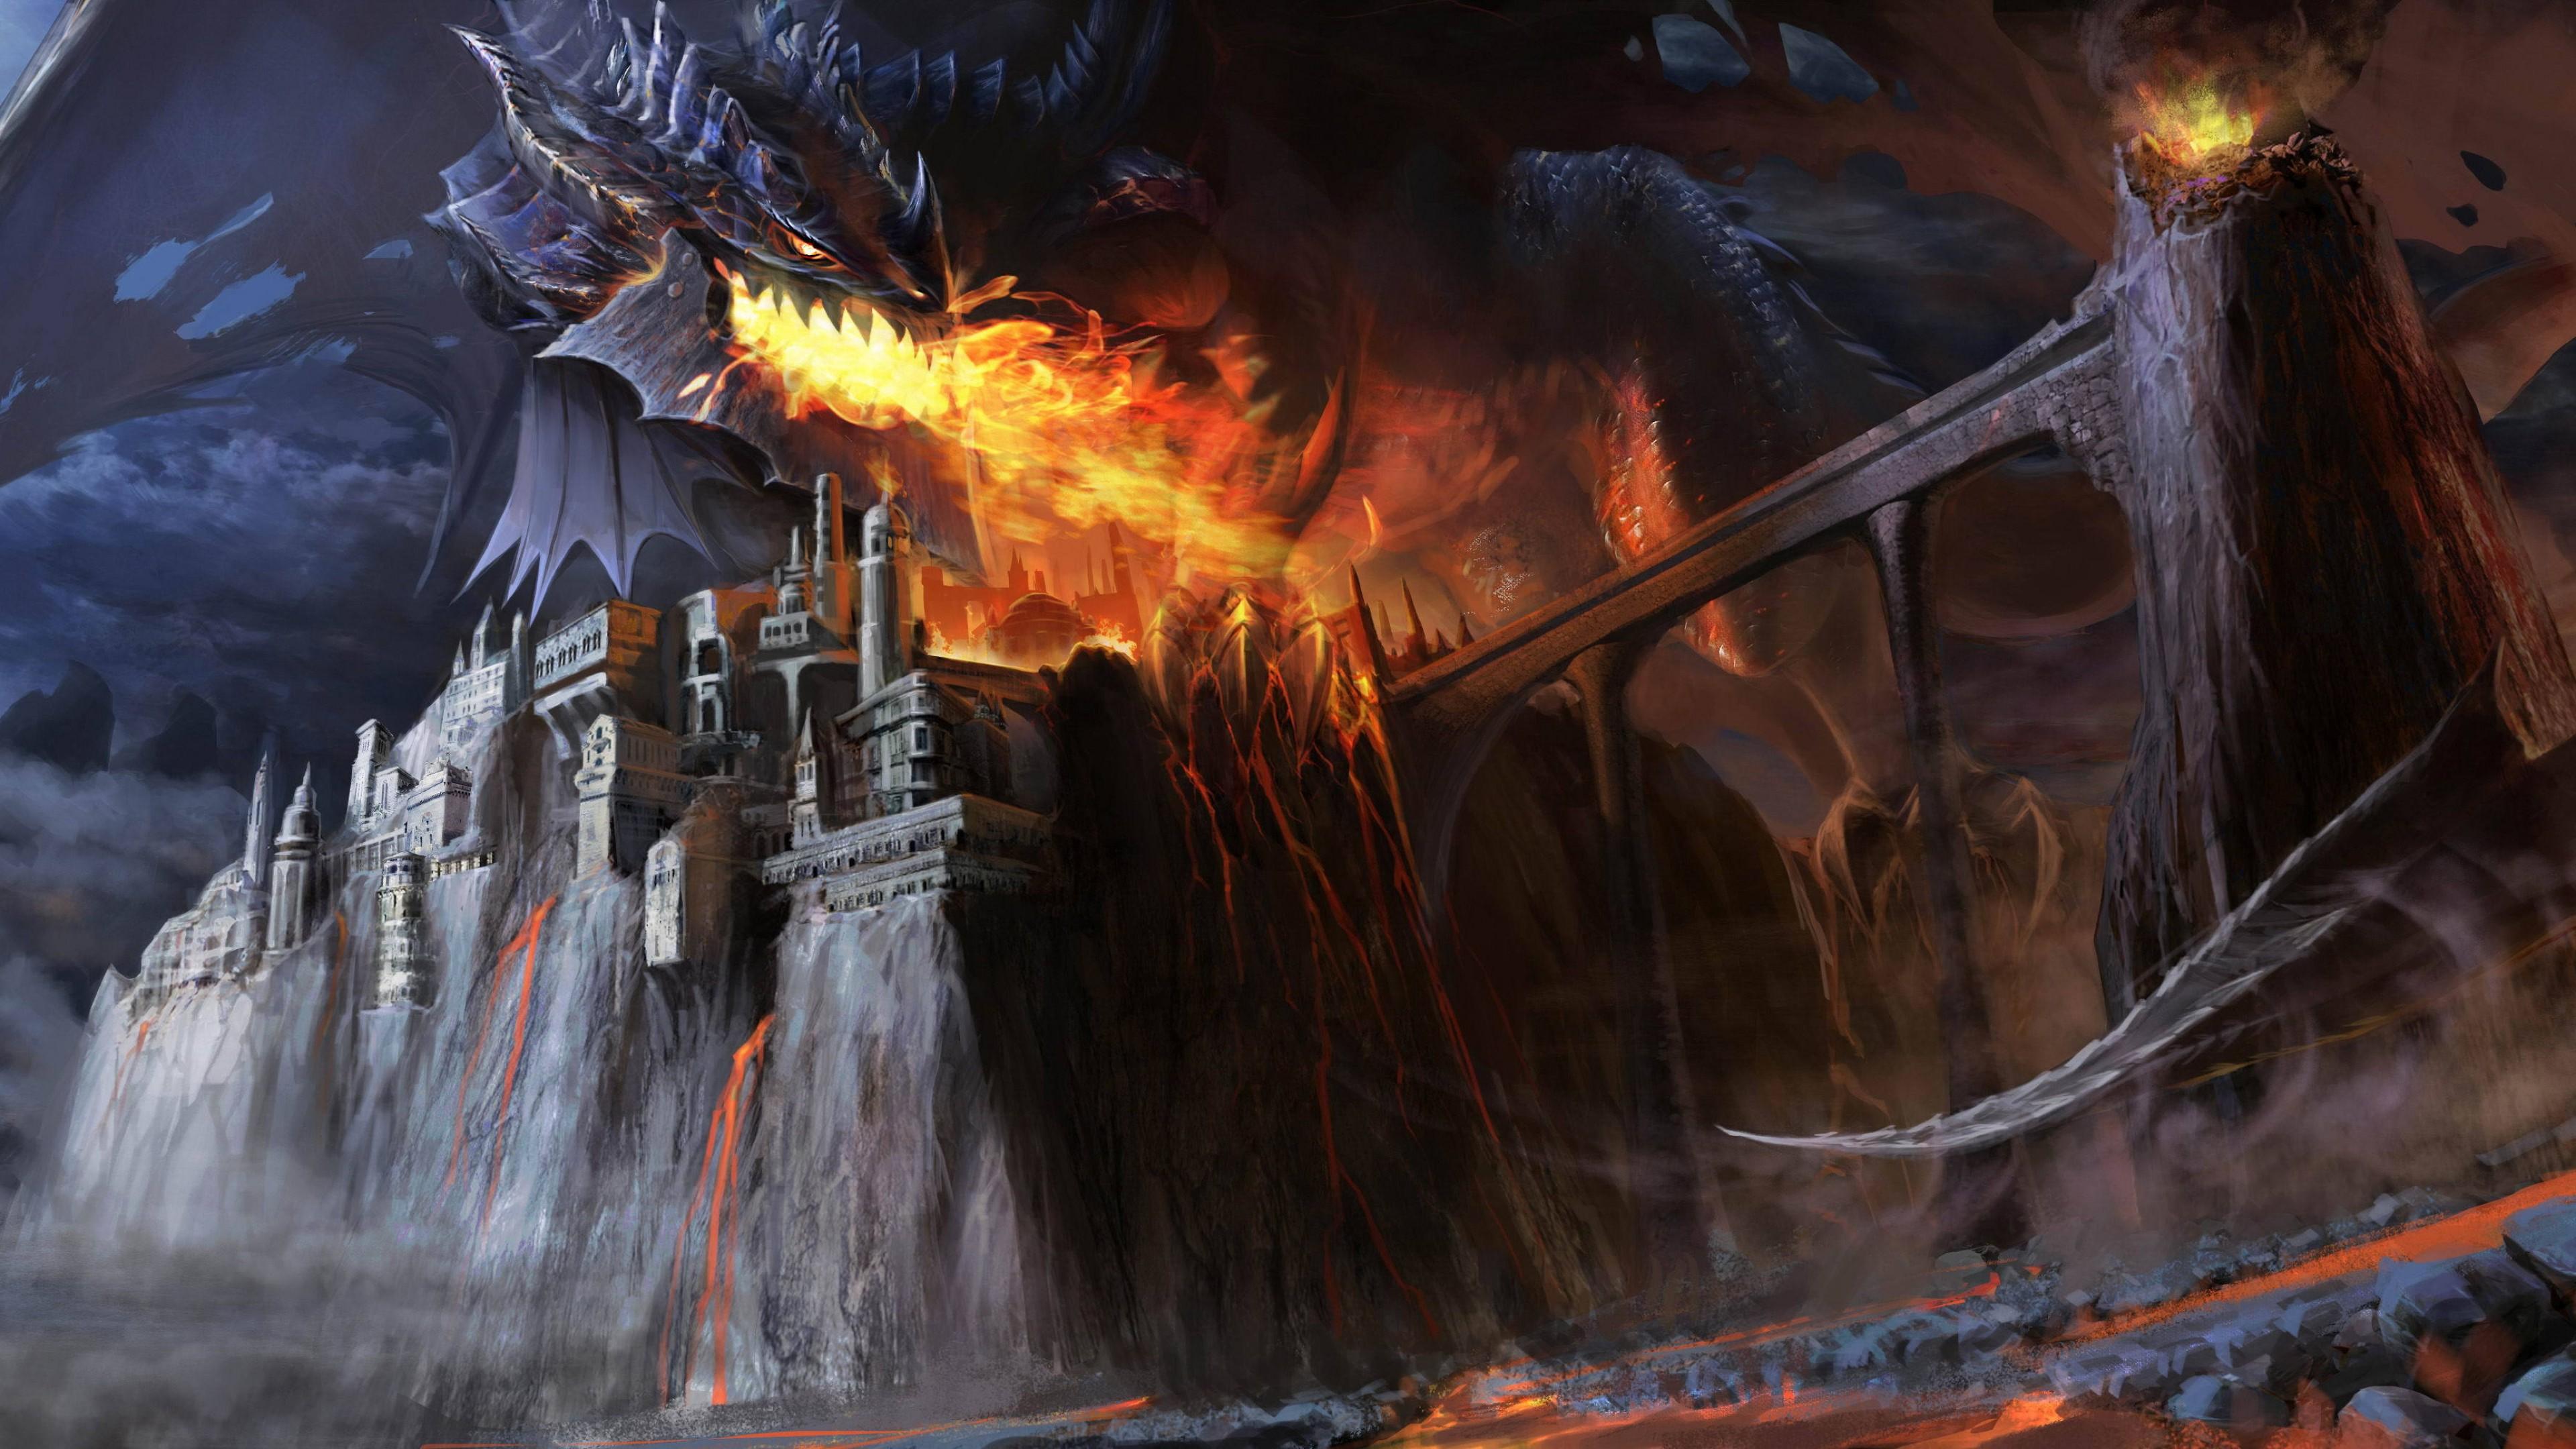 Wallpaper Dragon, Black, Fire, Castle, Bridge, Lava, Smoke -8188